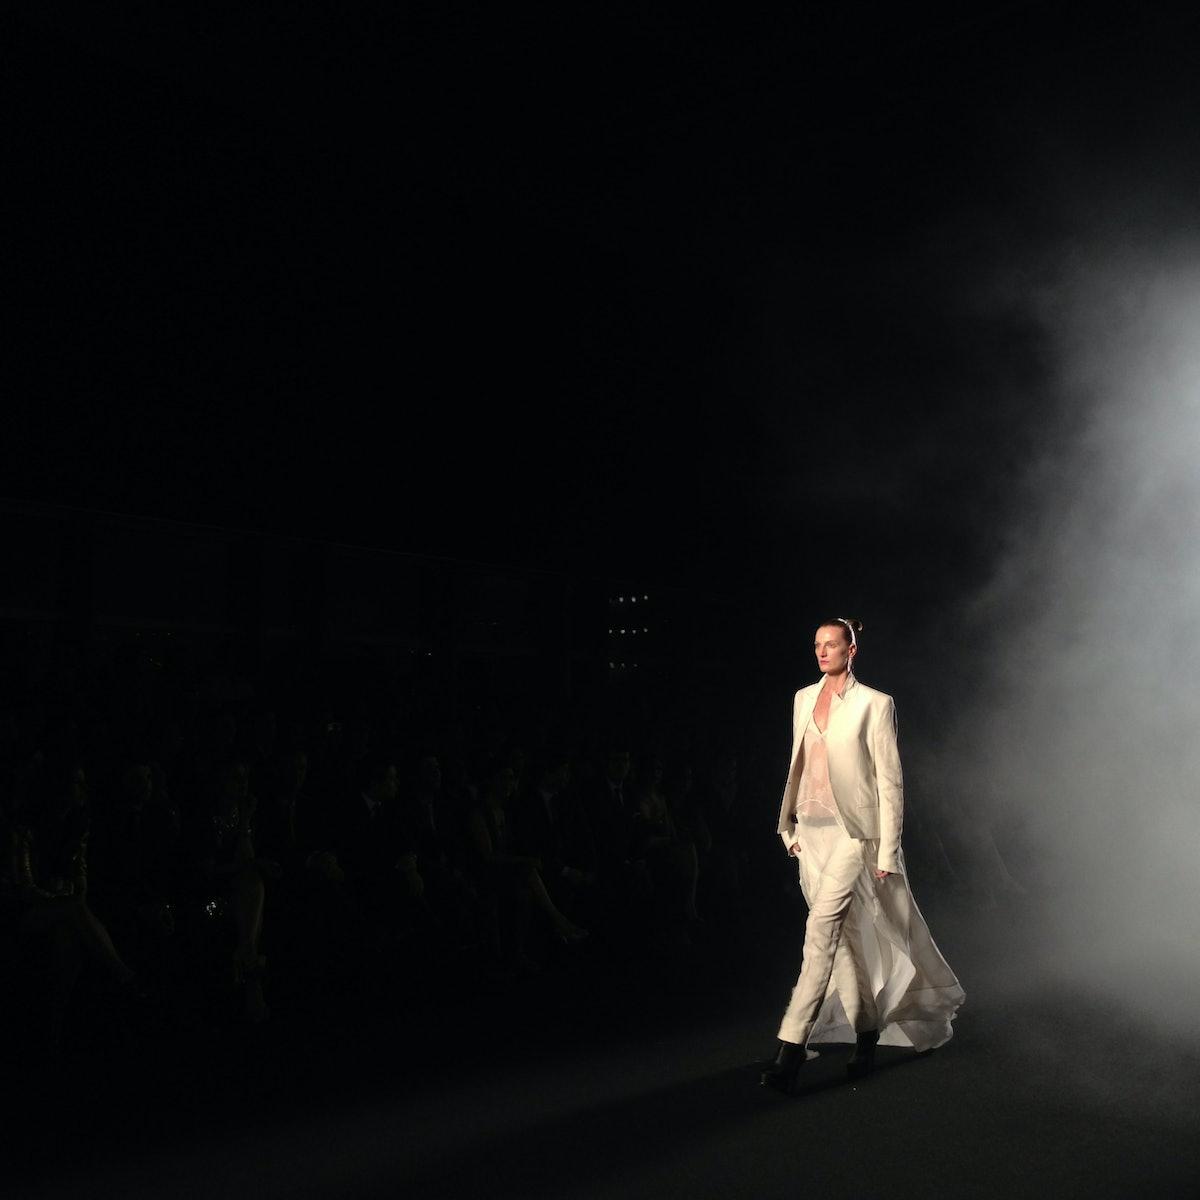 fass-colombiamoda-colombia-fashion-week-05